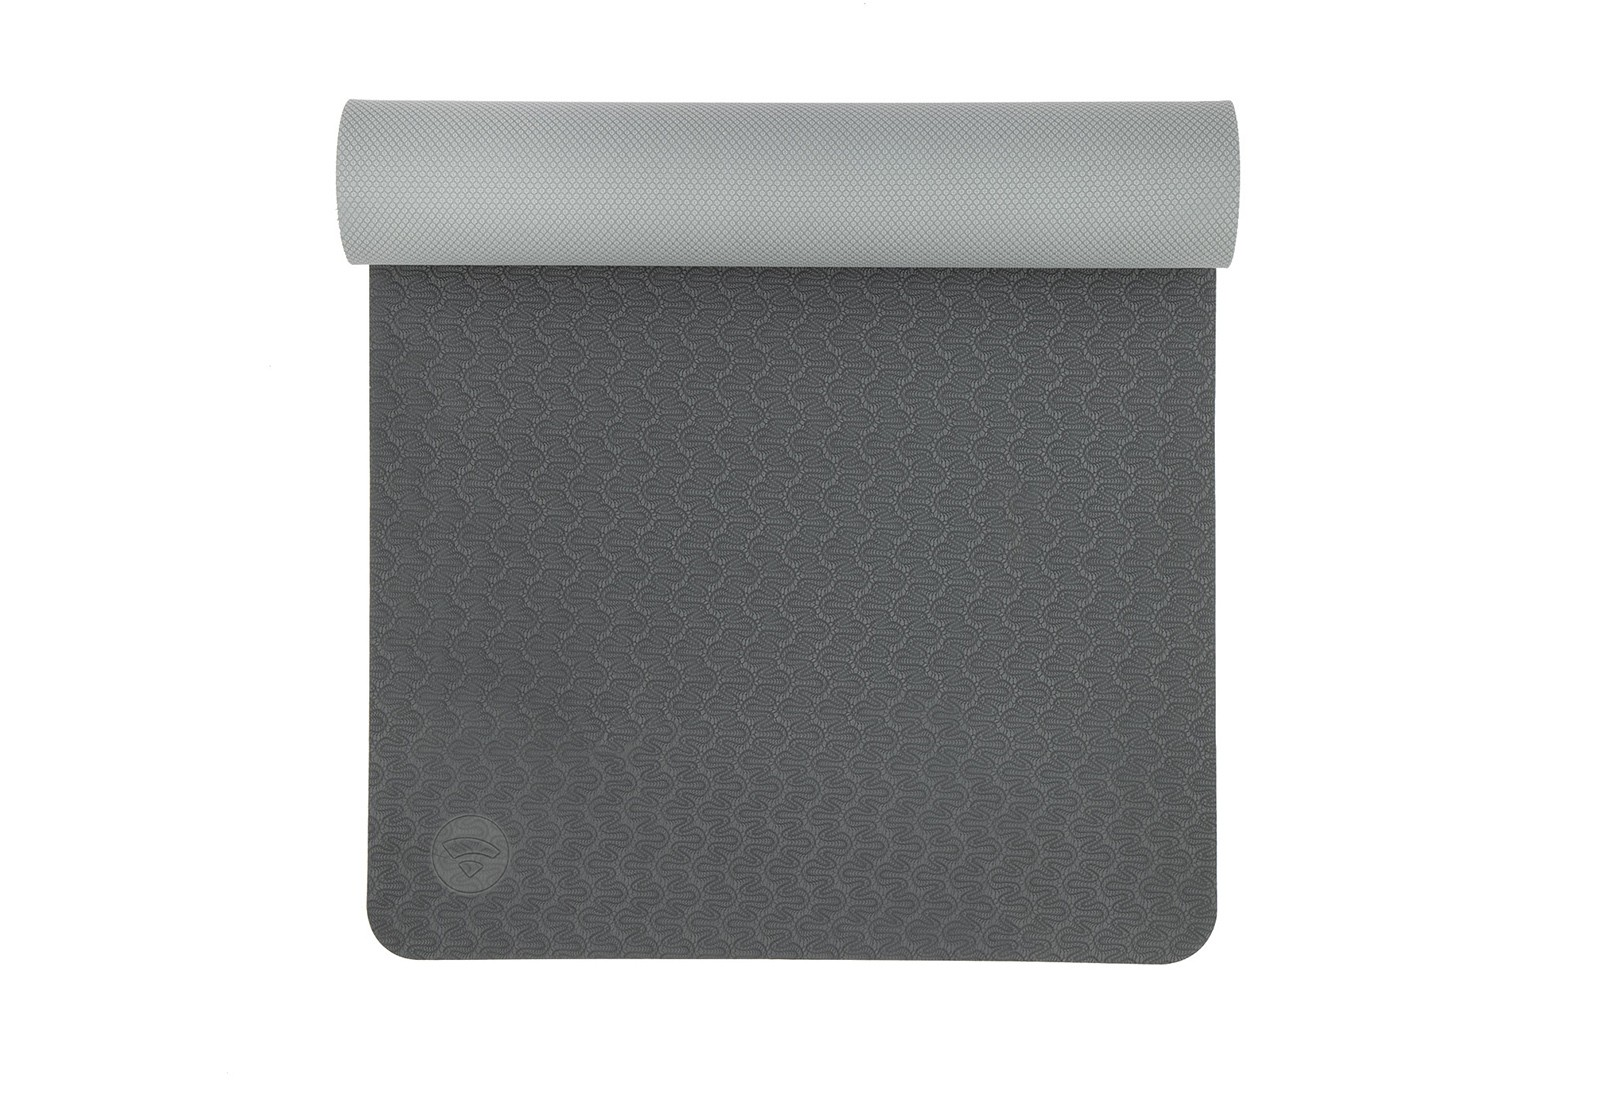 kovrik-dlya-jogi-lotus-pro-light-ot-bodhi-black-silver-grey-2021-01